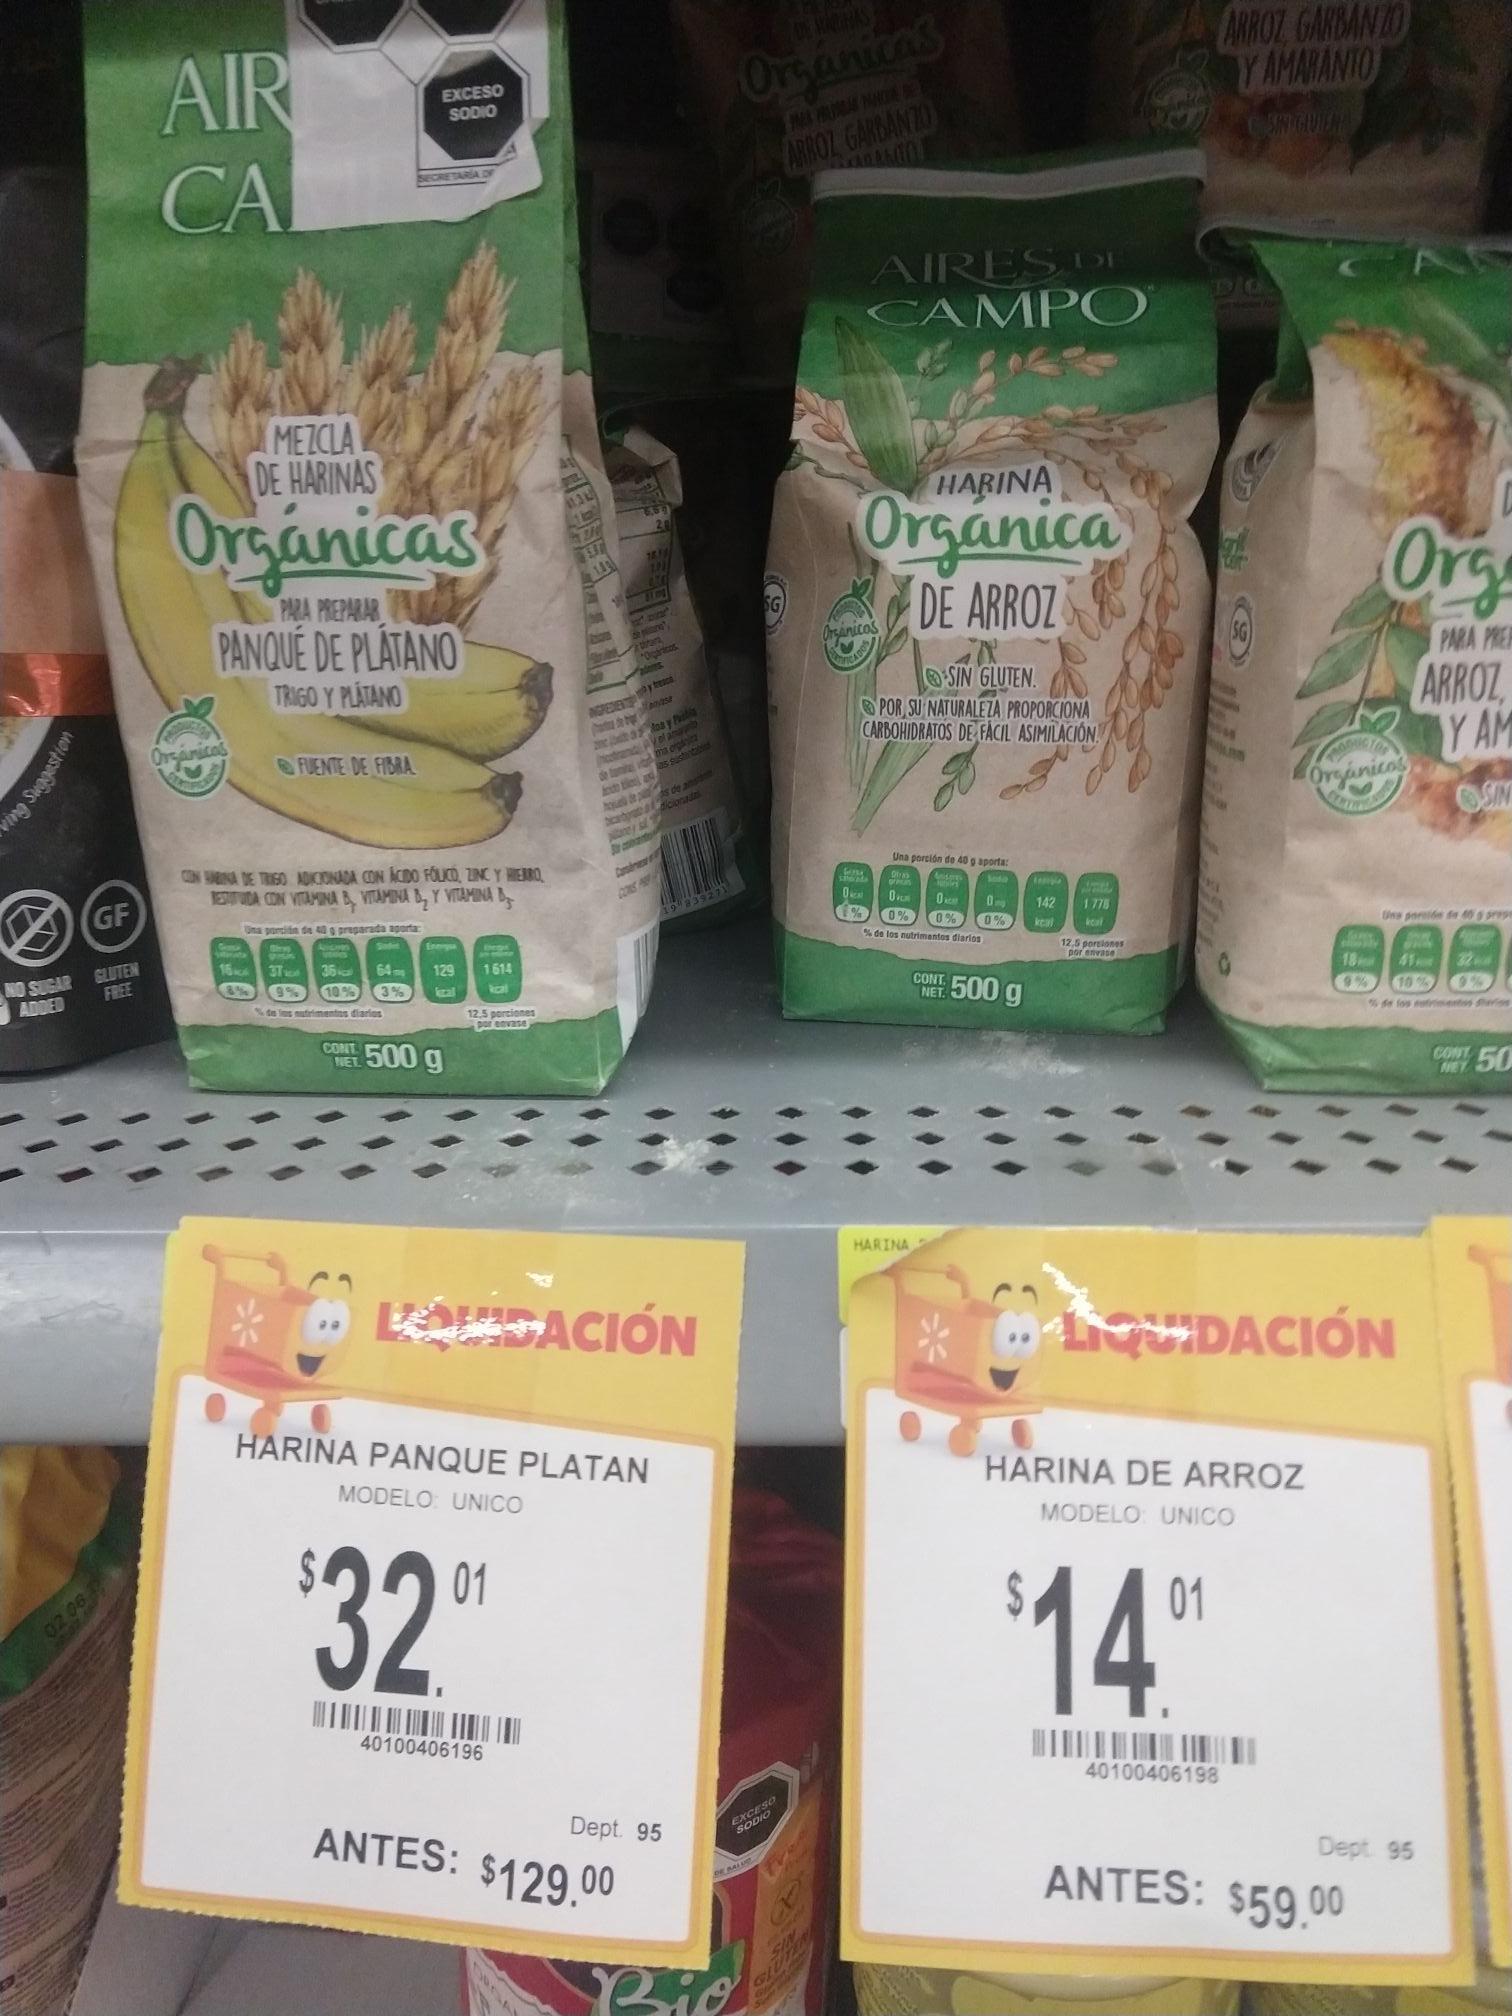 Walmart Aguascalientes: Harinas orgánicas